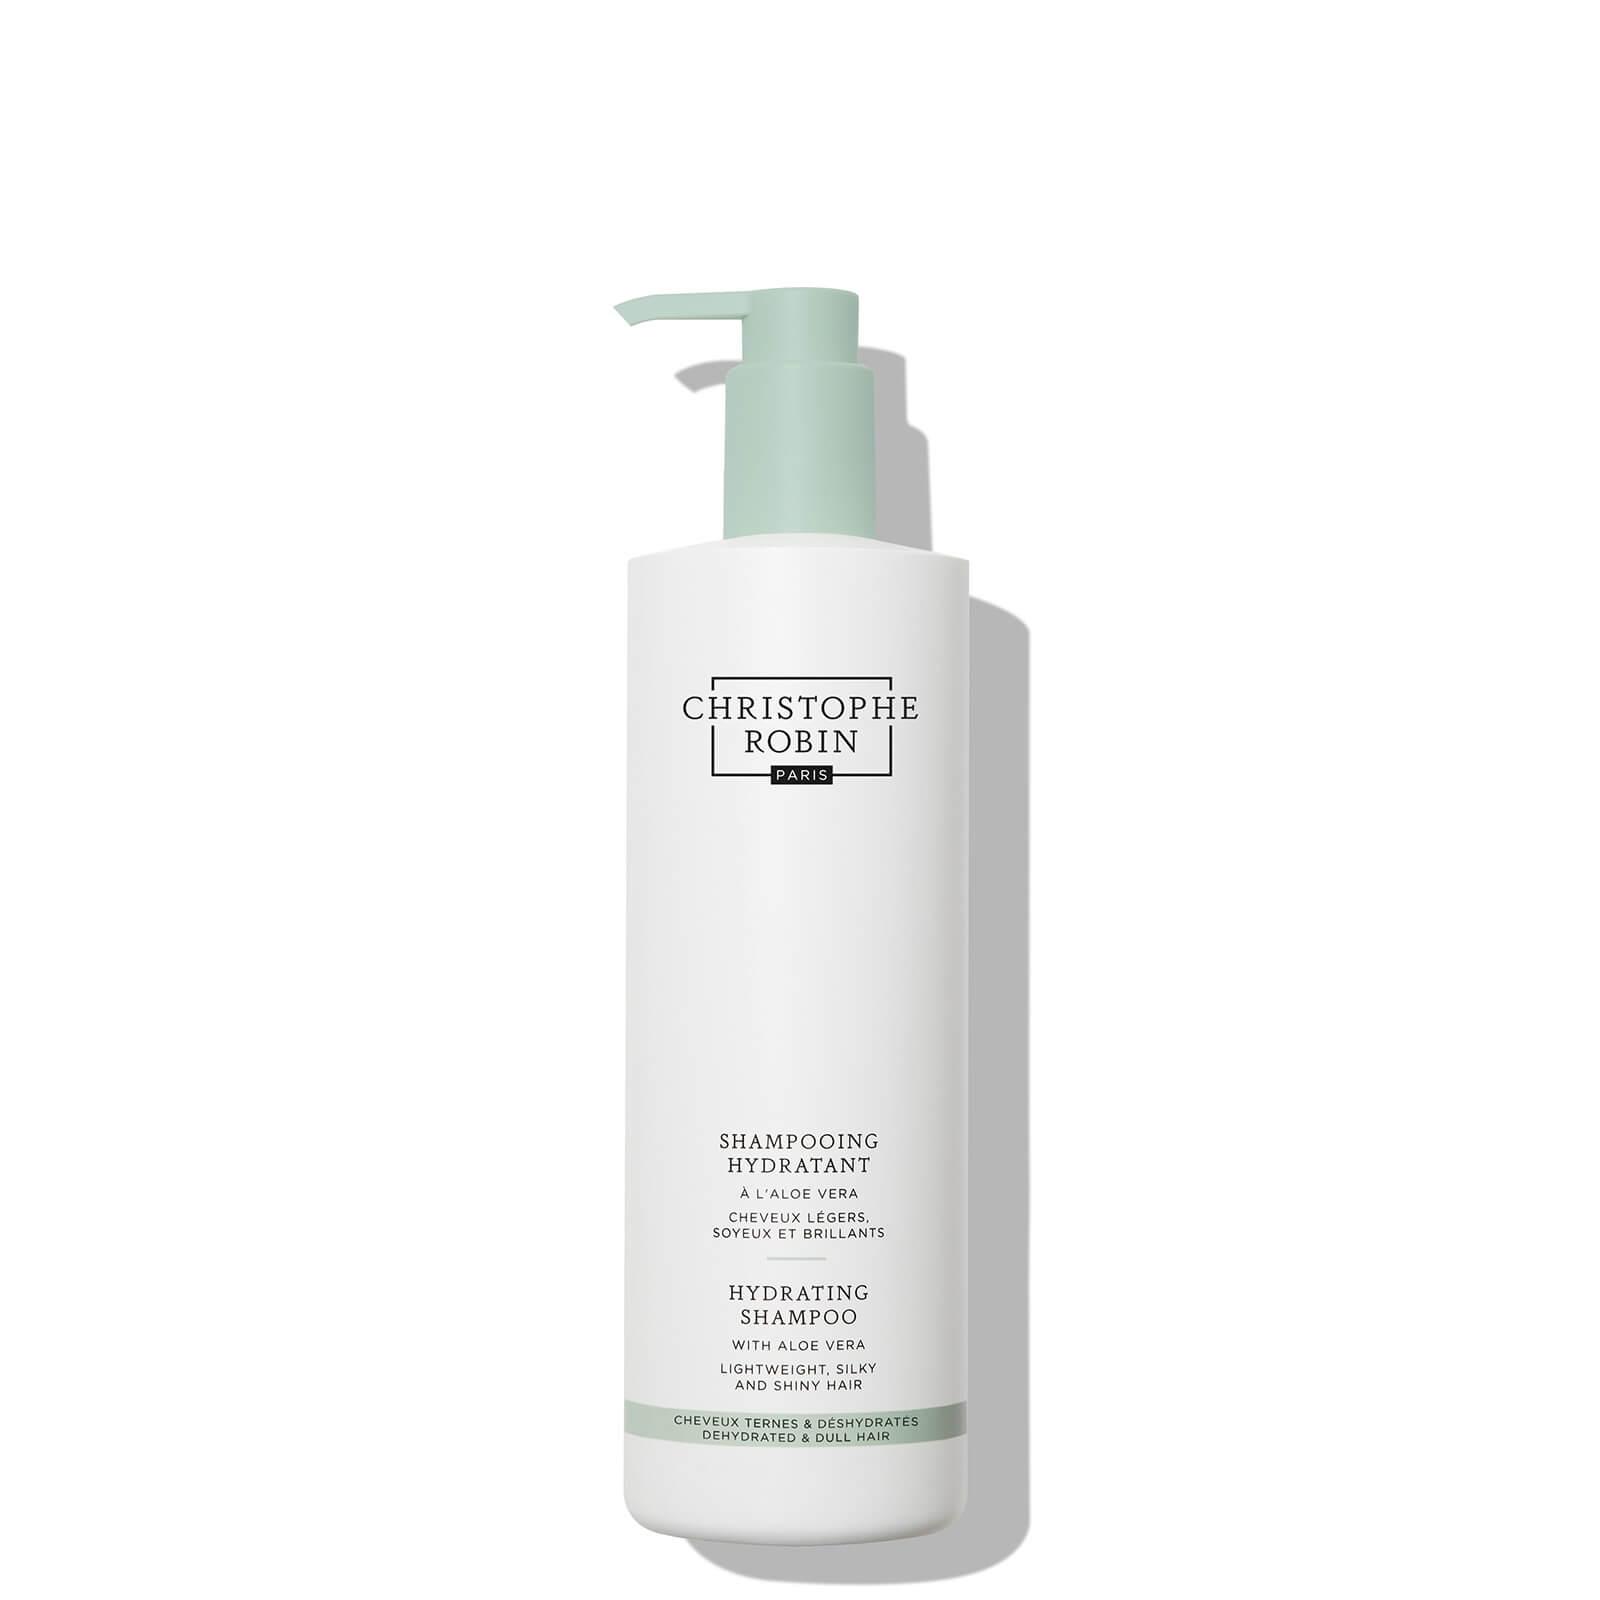 Купить Christophe Robin Hydrating Shampoo with Aloe Vera 500ml